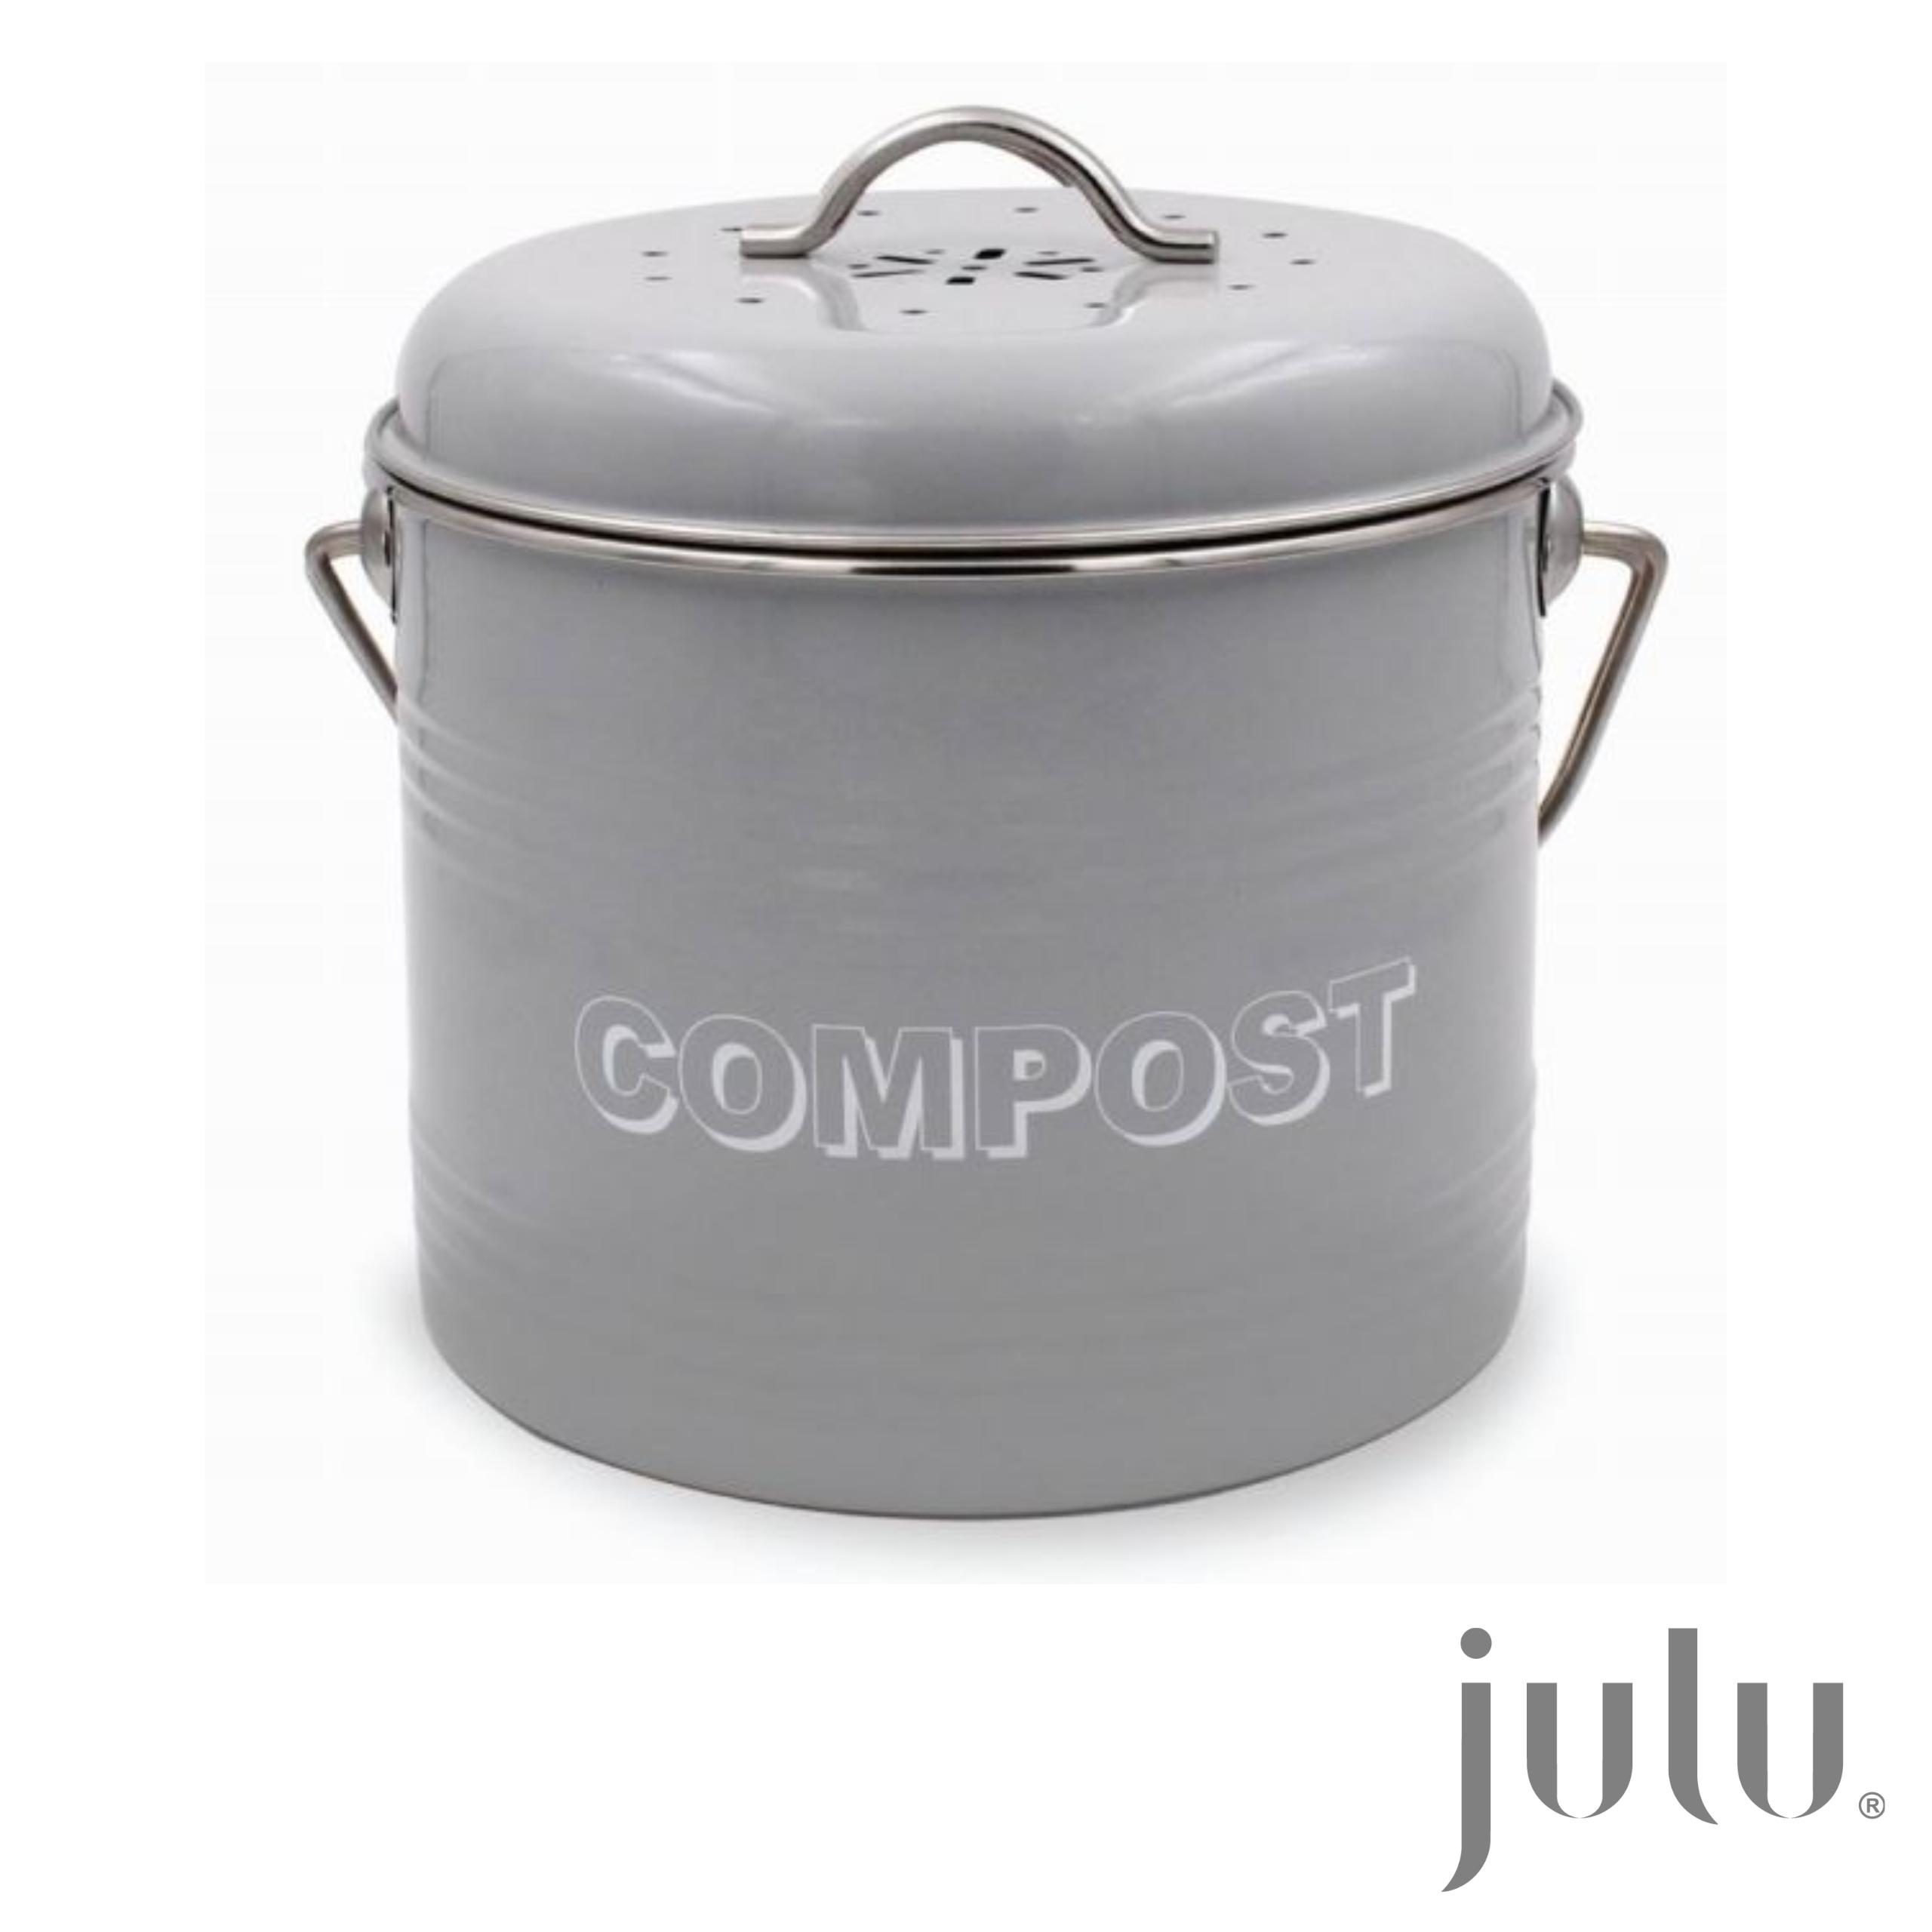 Compost Tin / Caddy